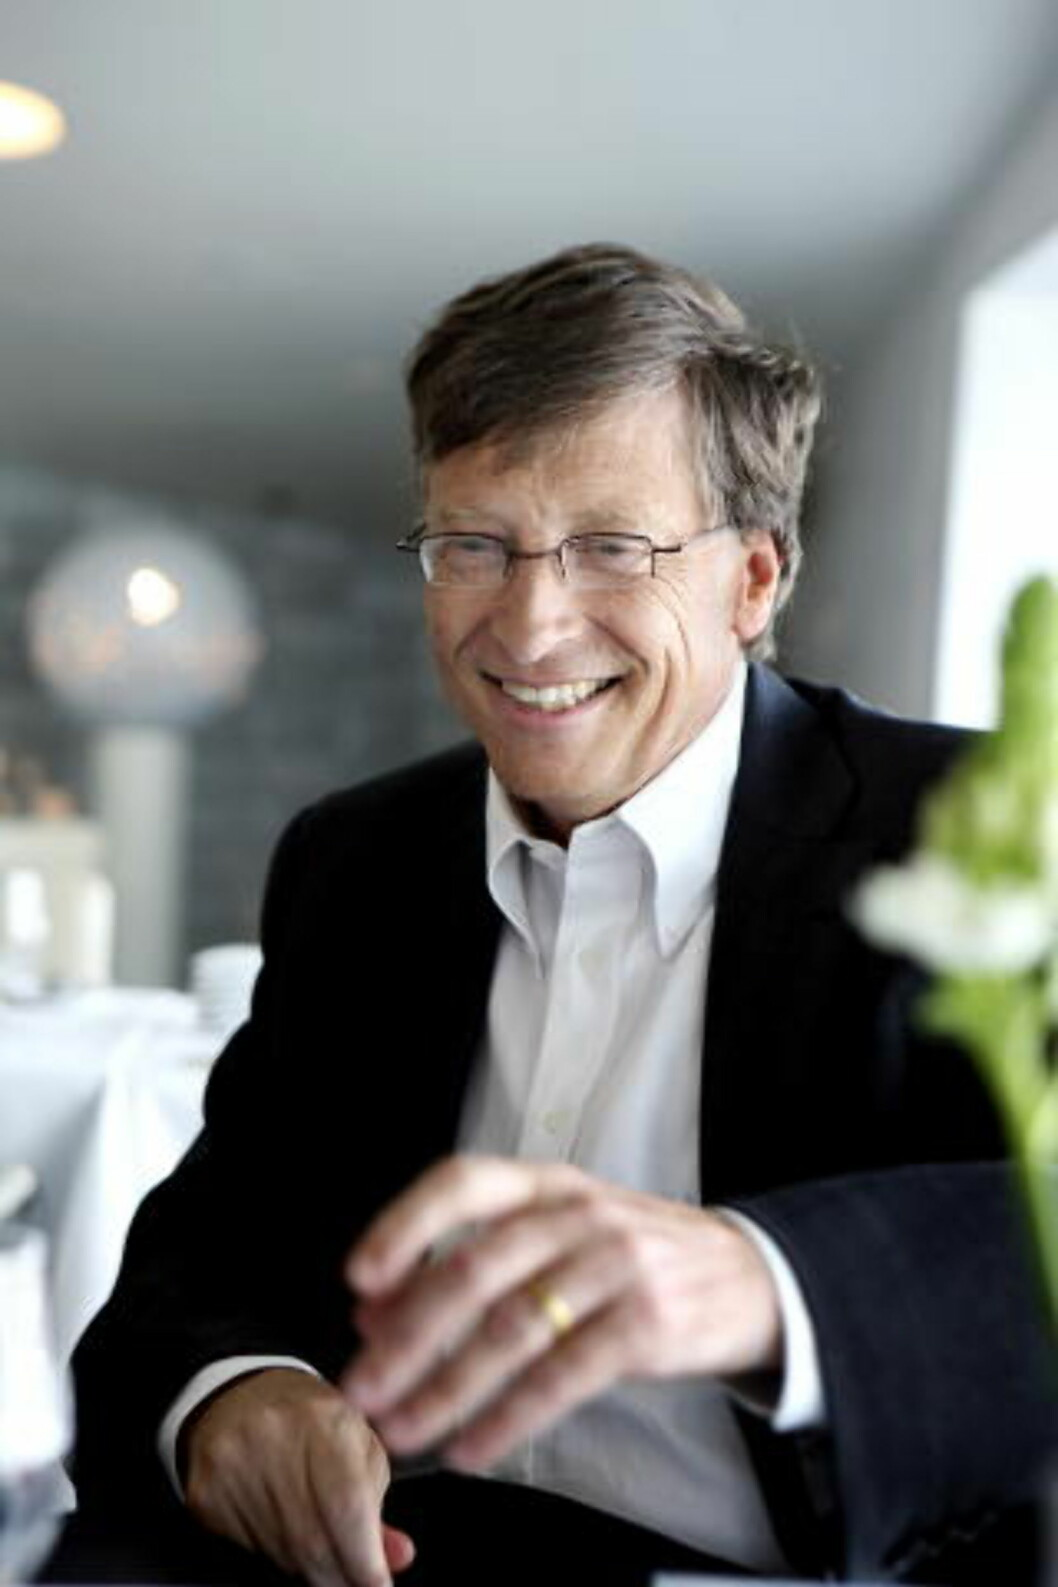 <strong>RIK:</strong> William Henry «Bill» Gates III er rik, men taper terreng til meksikaneren Carlos Slim Helu. Foto: Mette Randem/Dagbladet